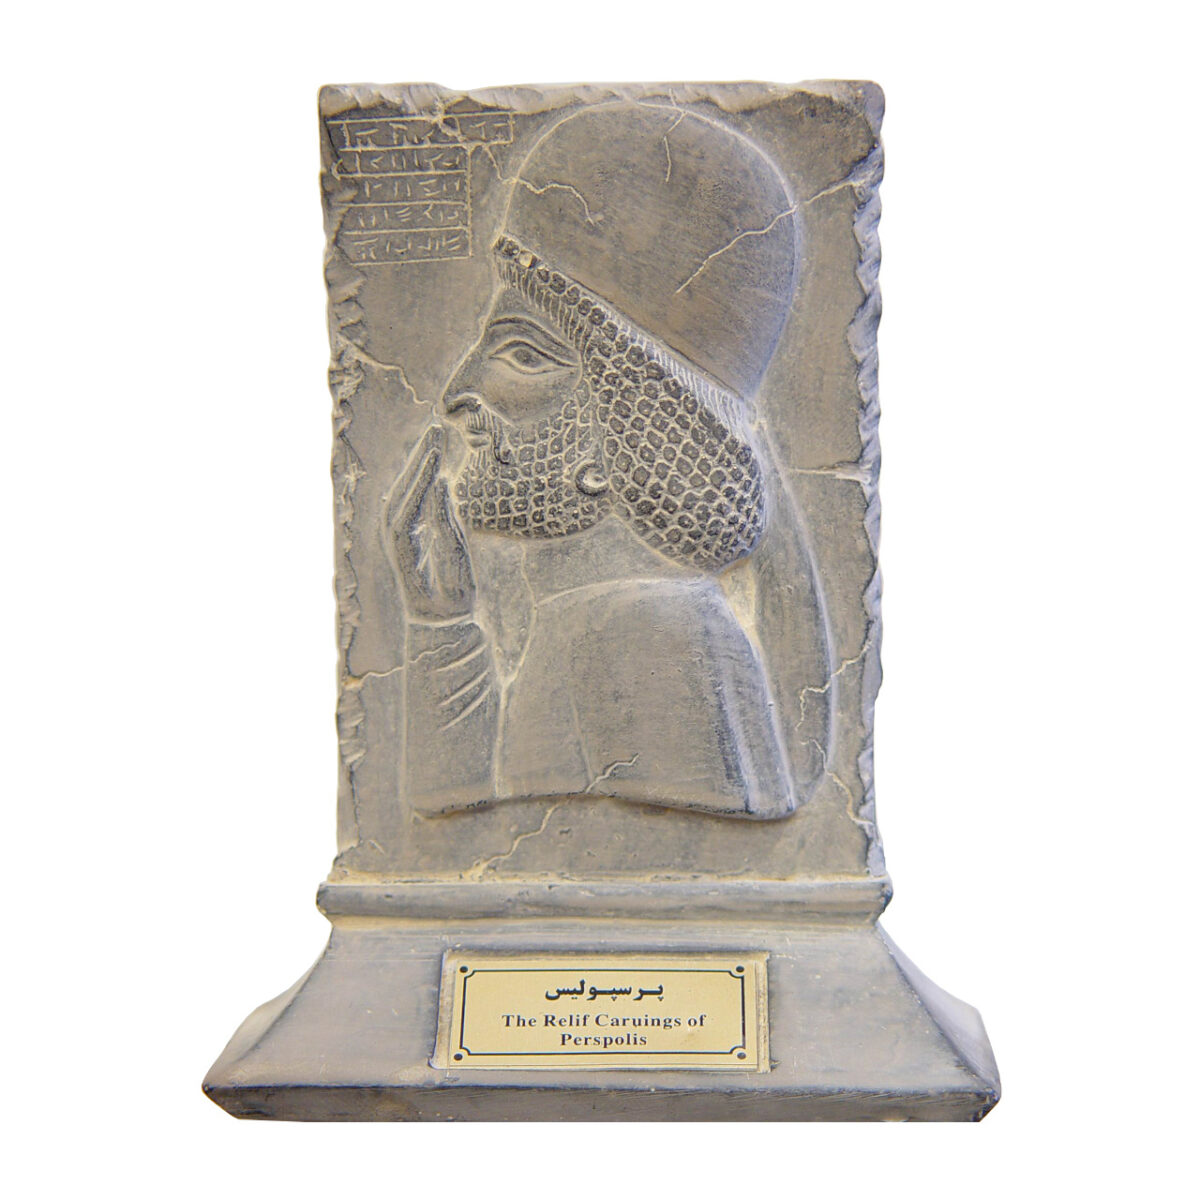 مجسمه تندیس و پیکره شهریار مدل لوح خدمتکار پرسپولیس کد MO1080